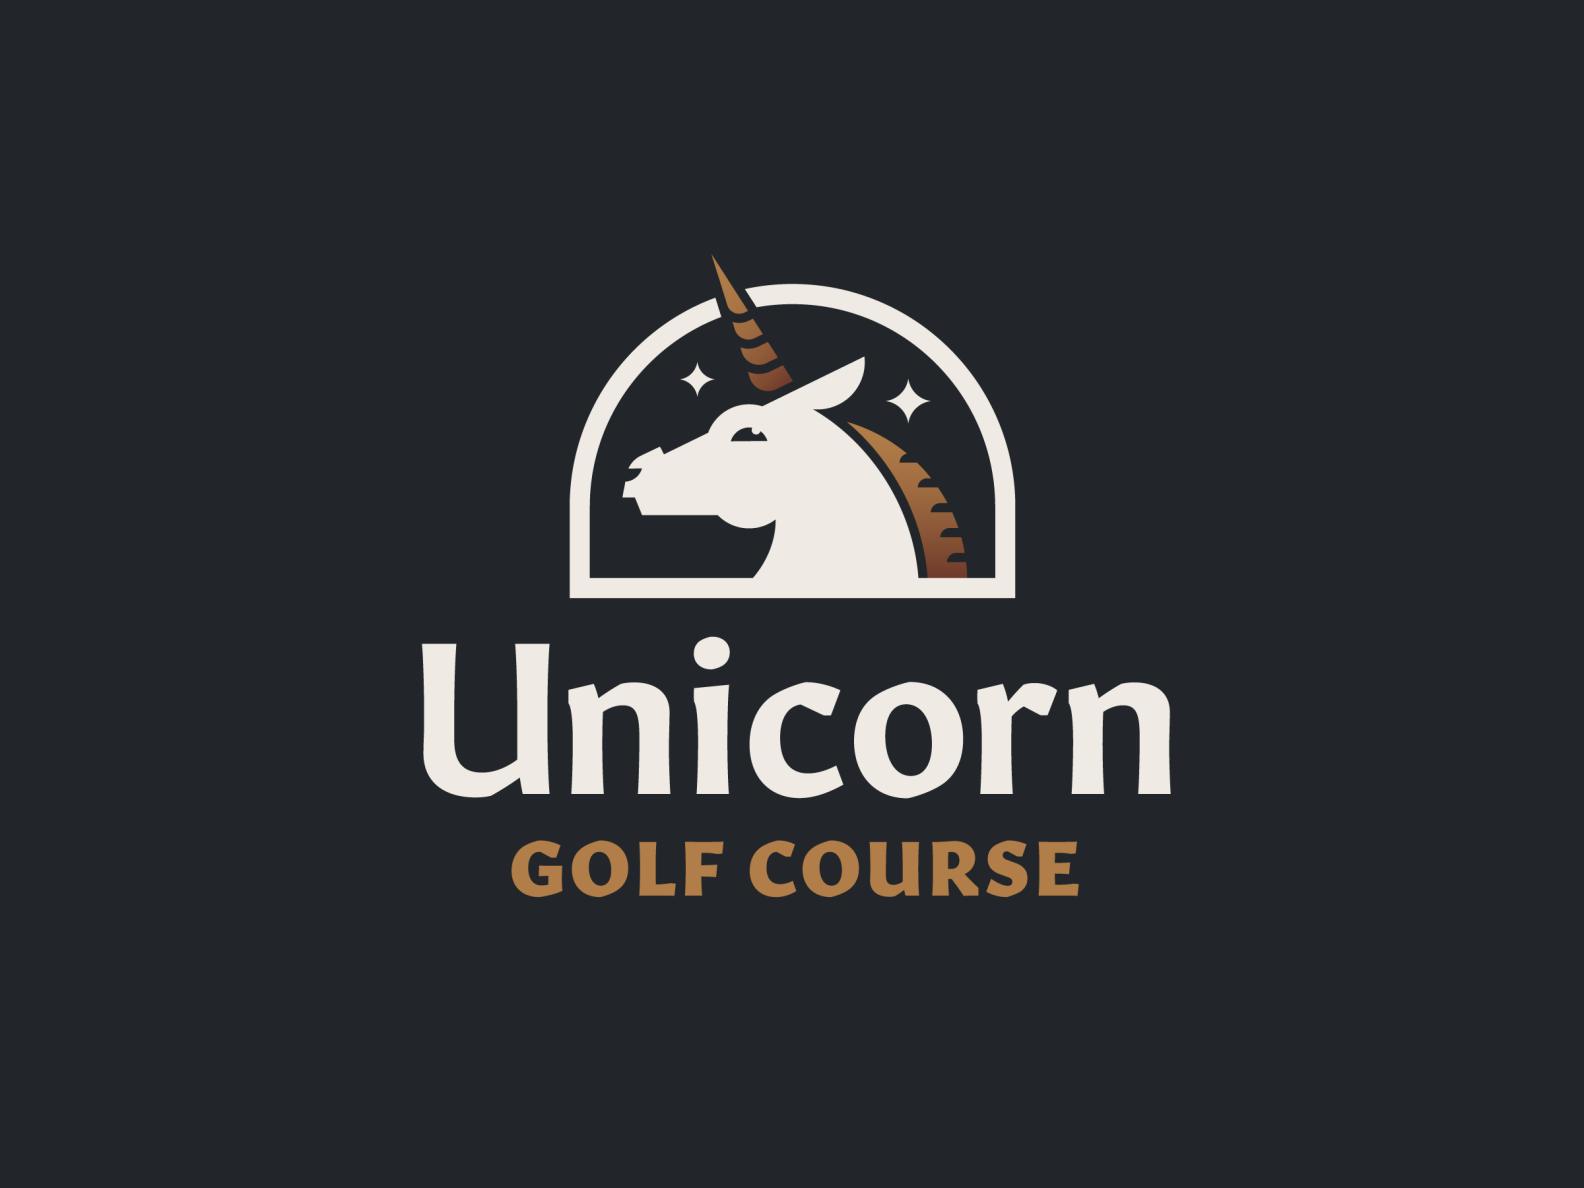 Unicorn Golf Course — 1 𝑜𝑓 3